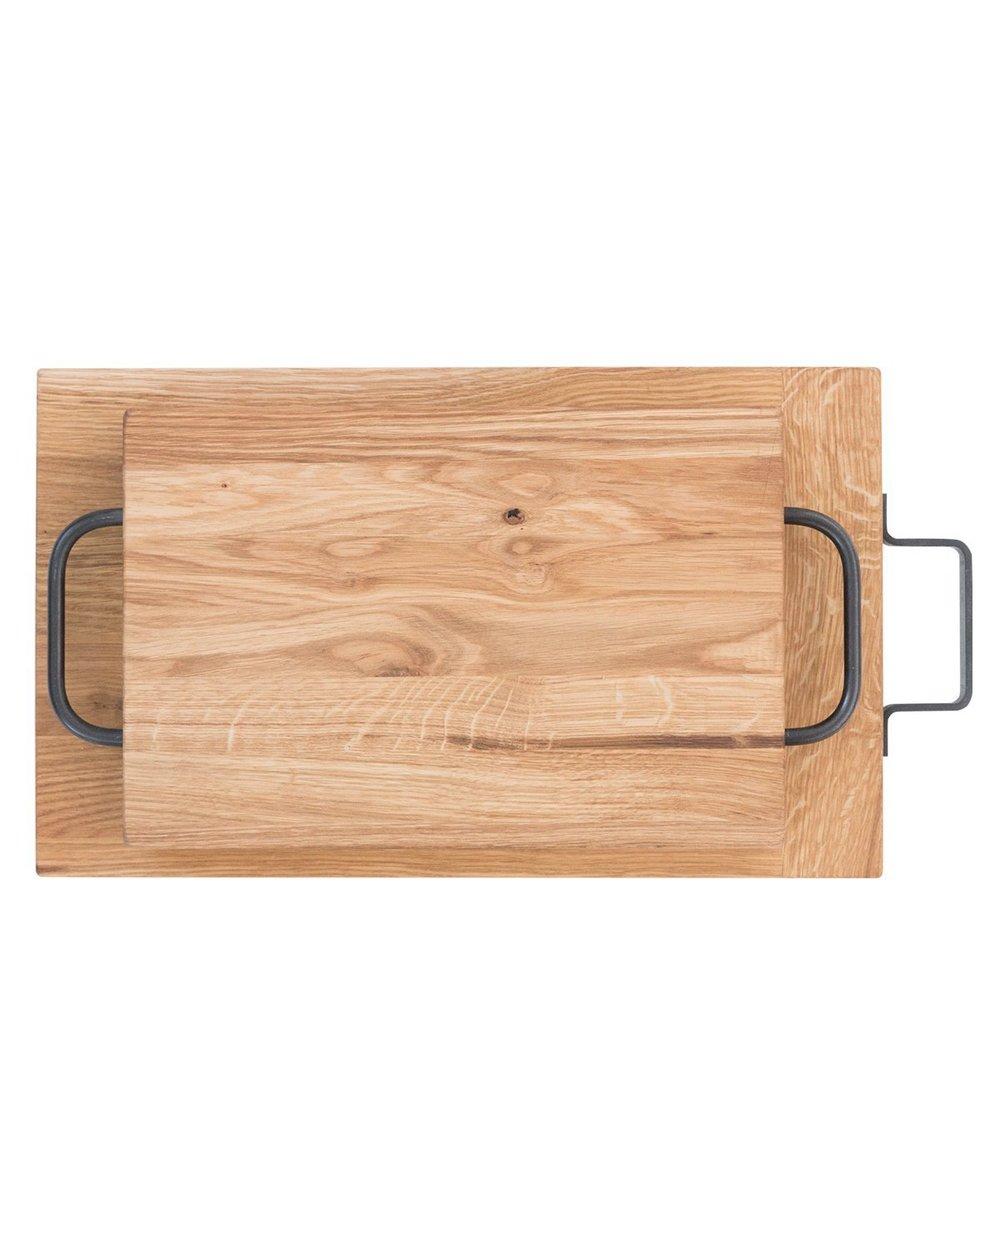 Iron_Handled_Cutting_Board_1.jpg